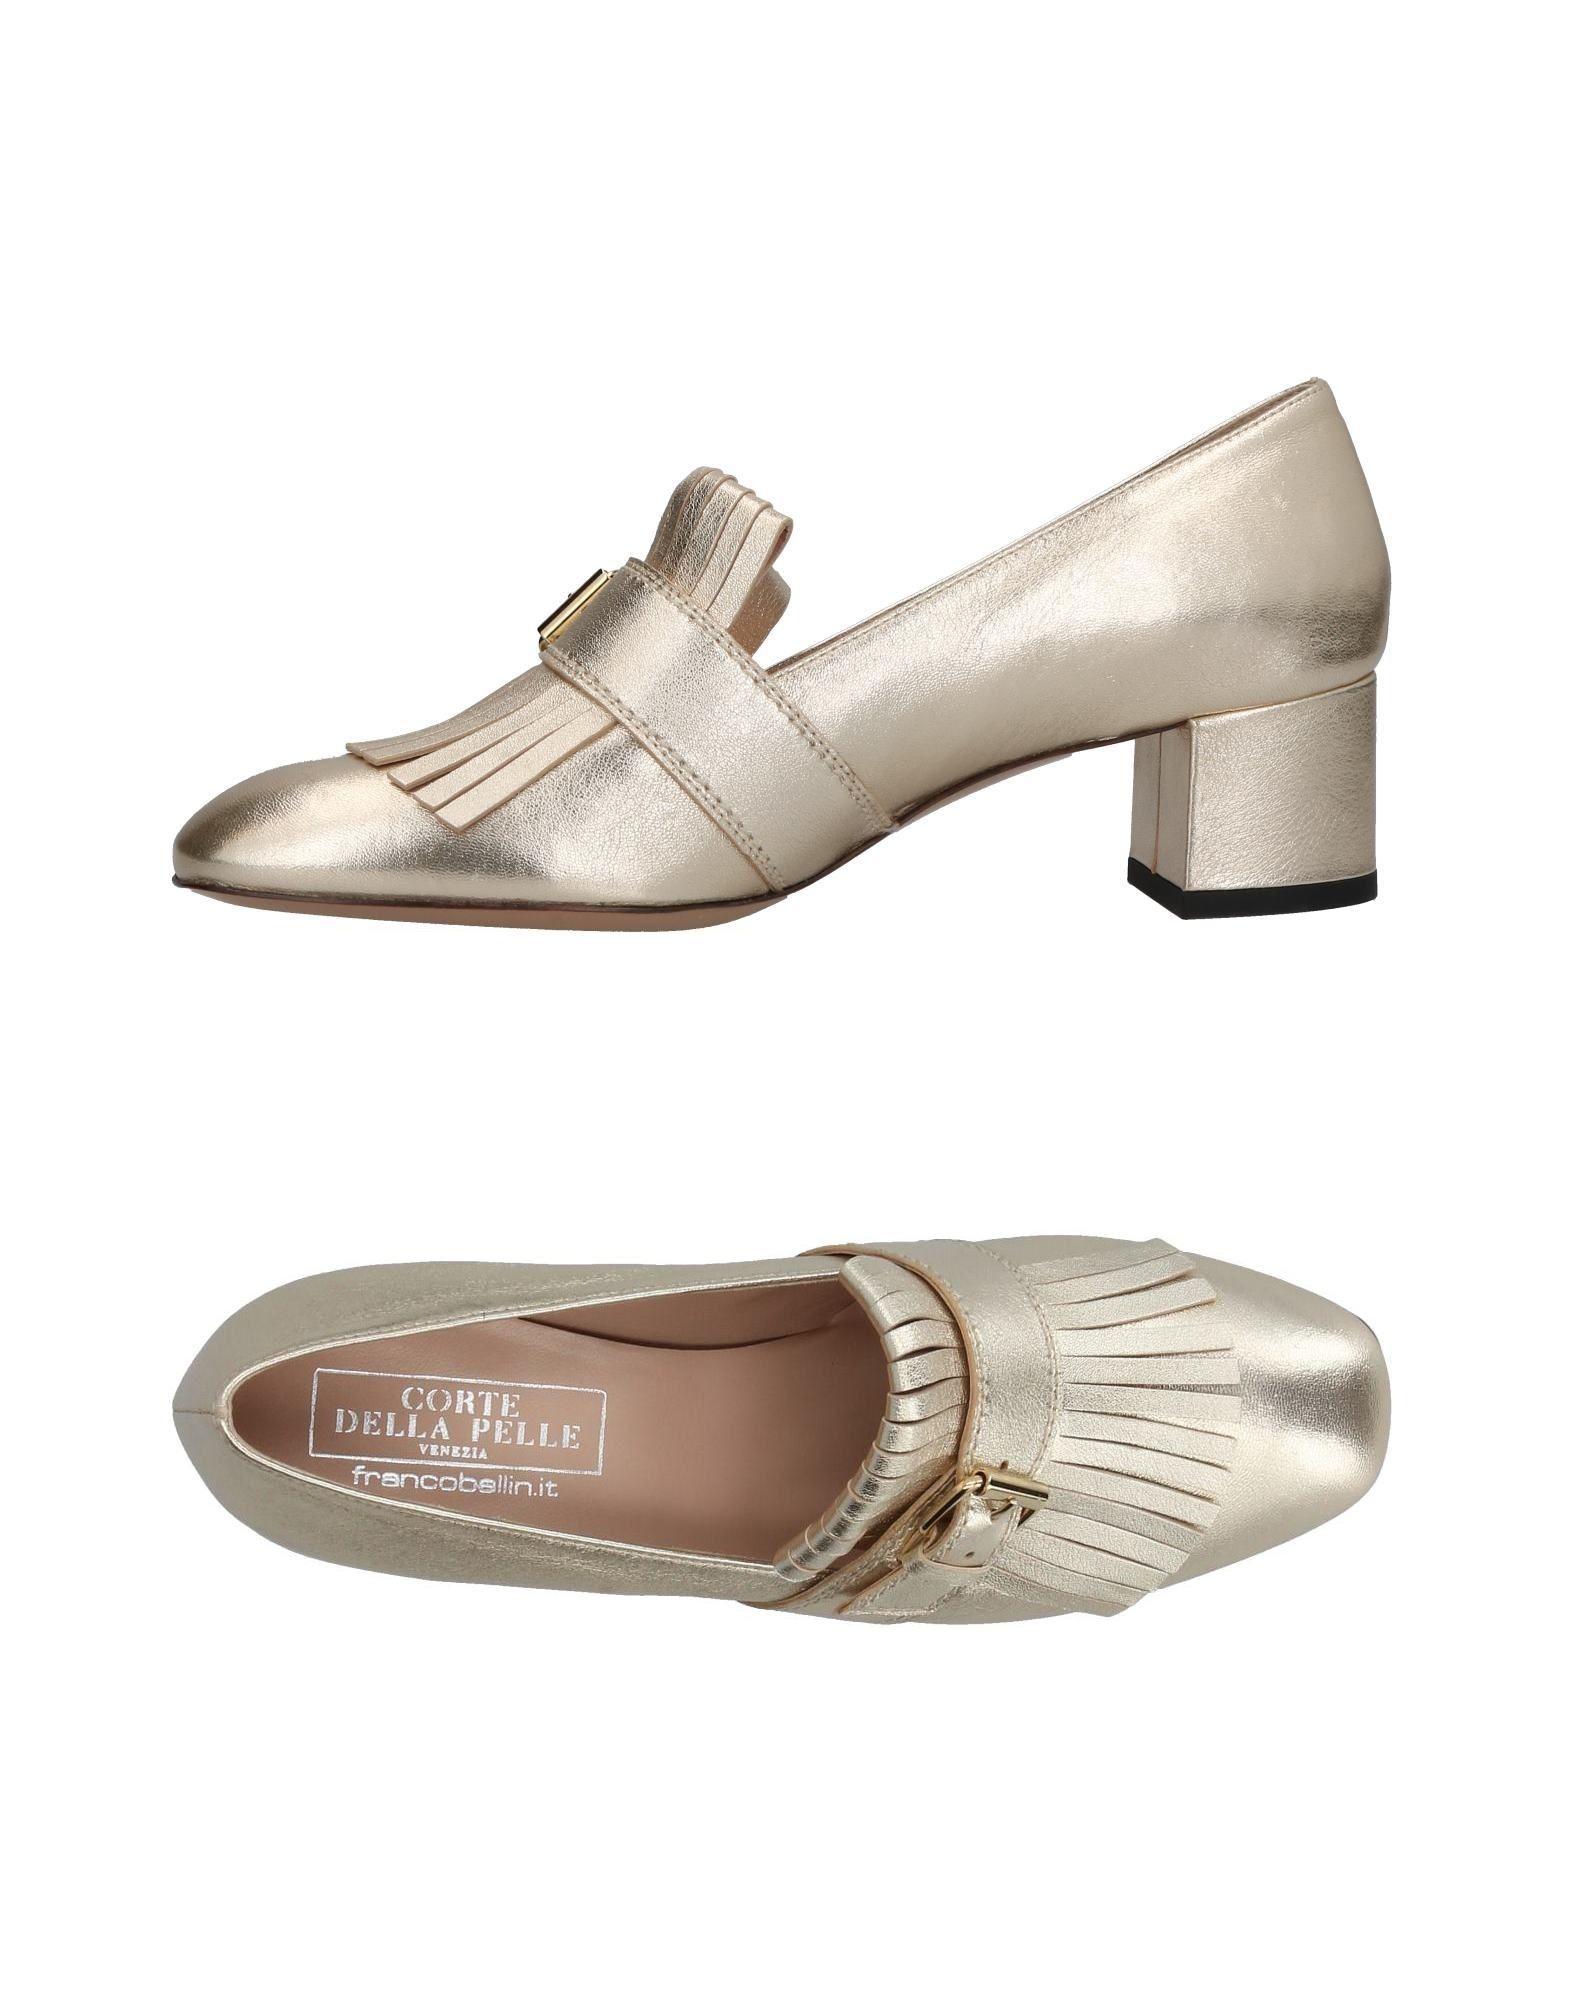 La Corte Della Pelle By Franco Ballin Mokassins Damen  11374848VO Gute Qualität beliebte Schuhe